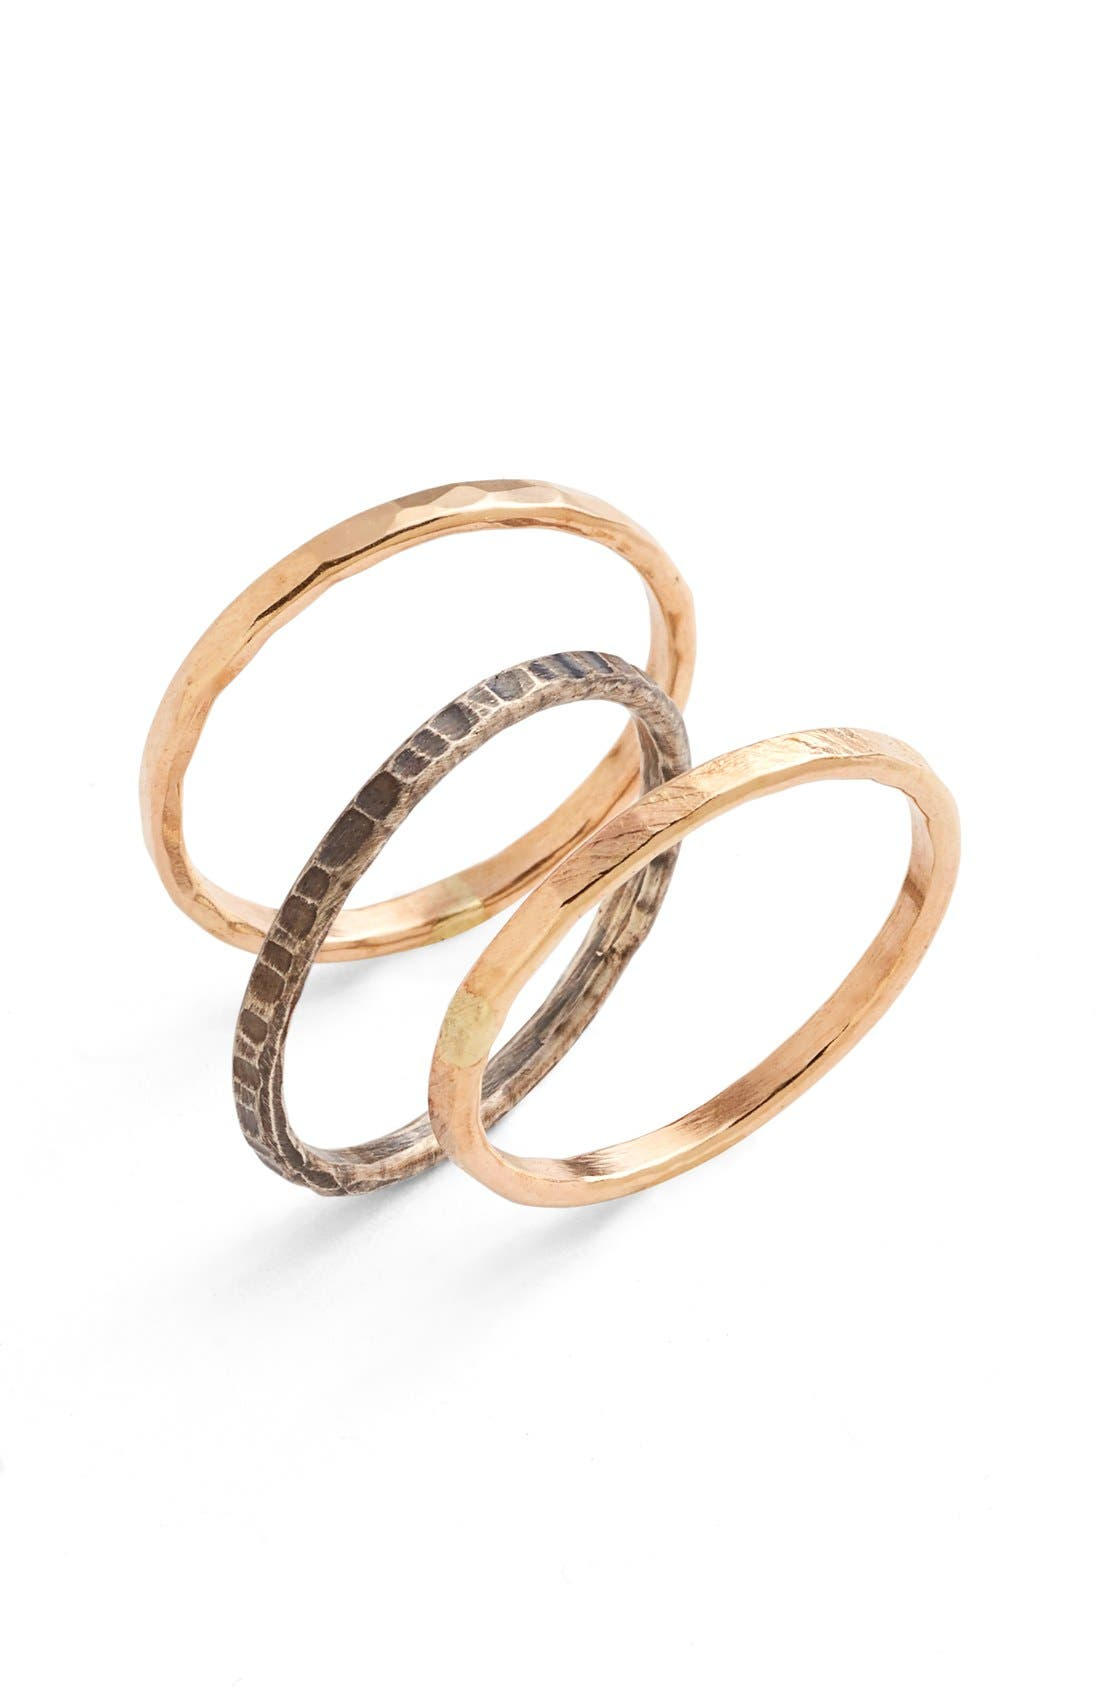 Alternate Image 1 Selected - Nashelle Ija Stackable Hammered Rings (Set of 3)